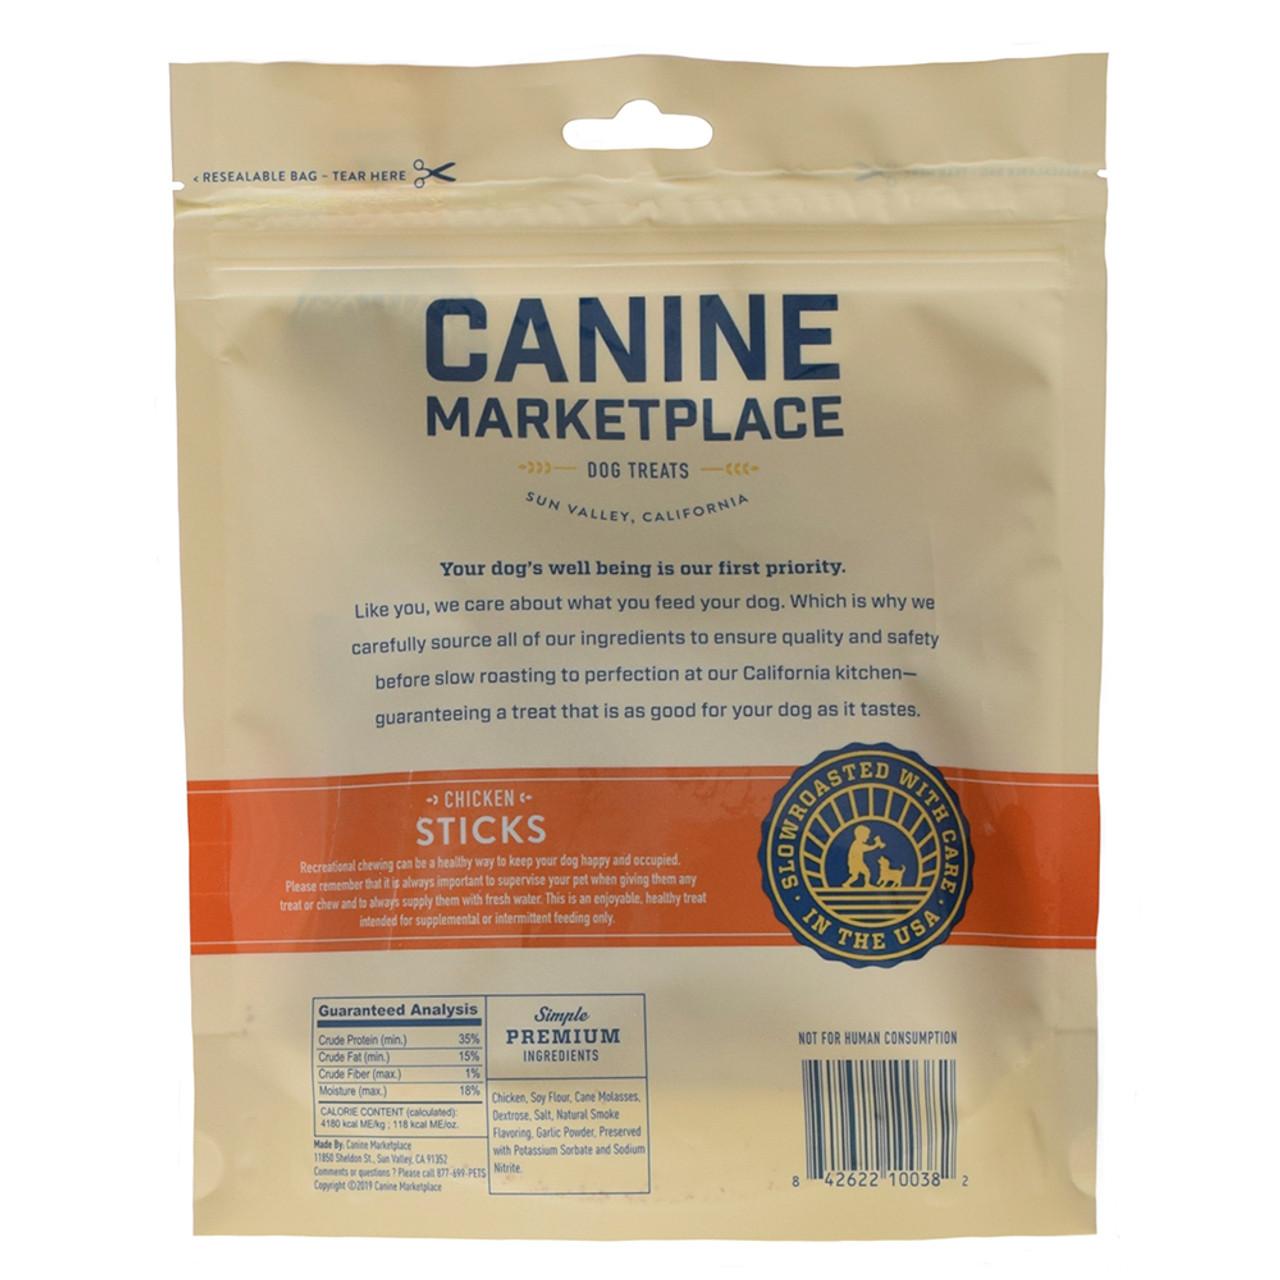 Canine Marketplace Chicken Sticks Natural Dog Treats